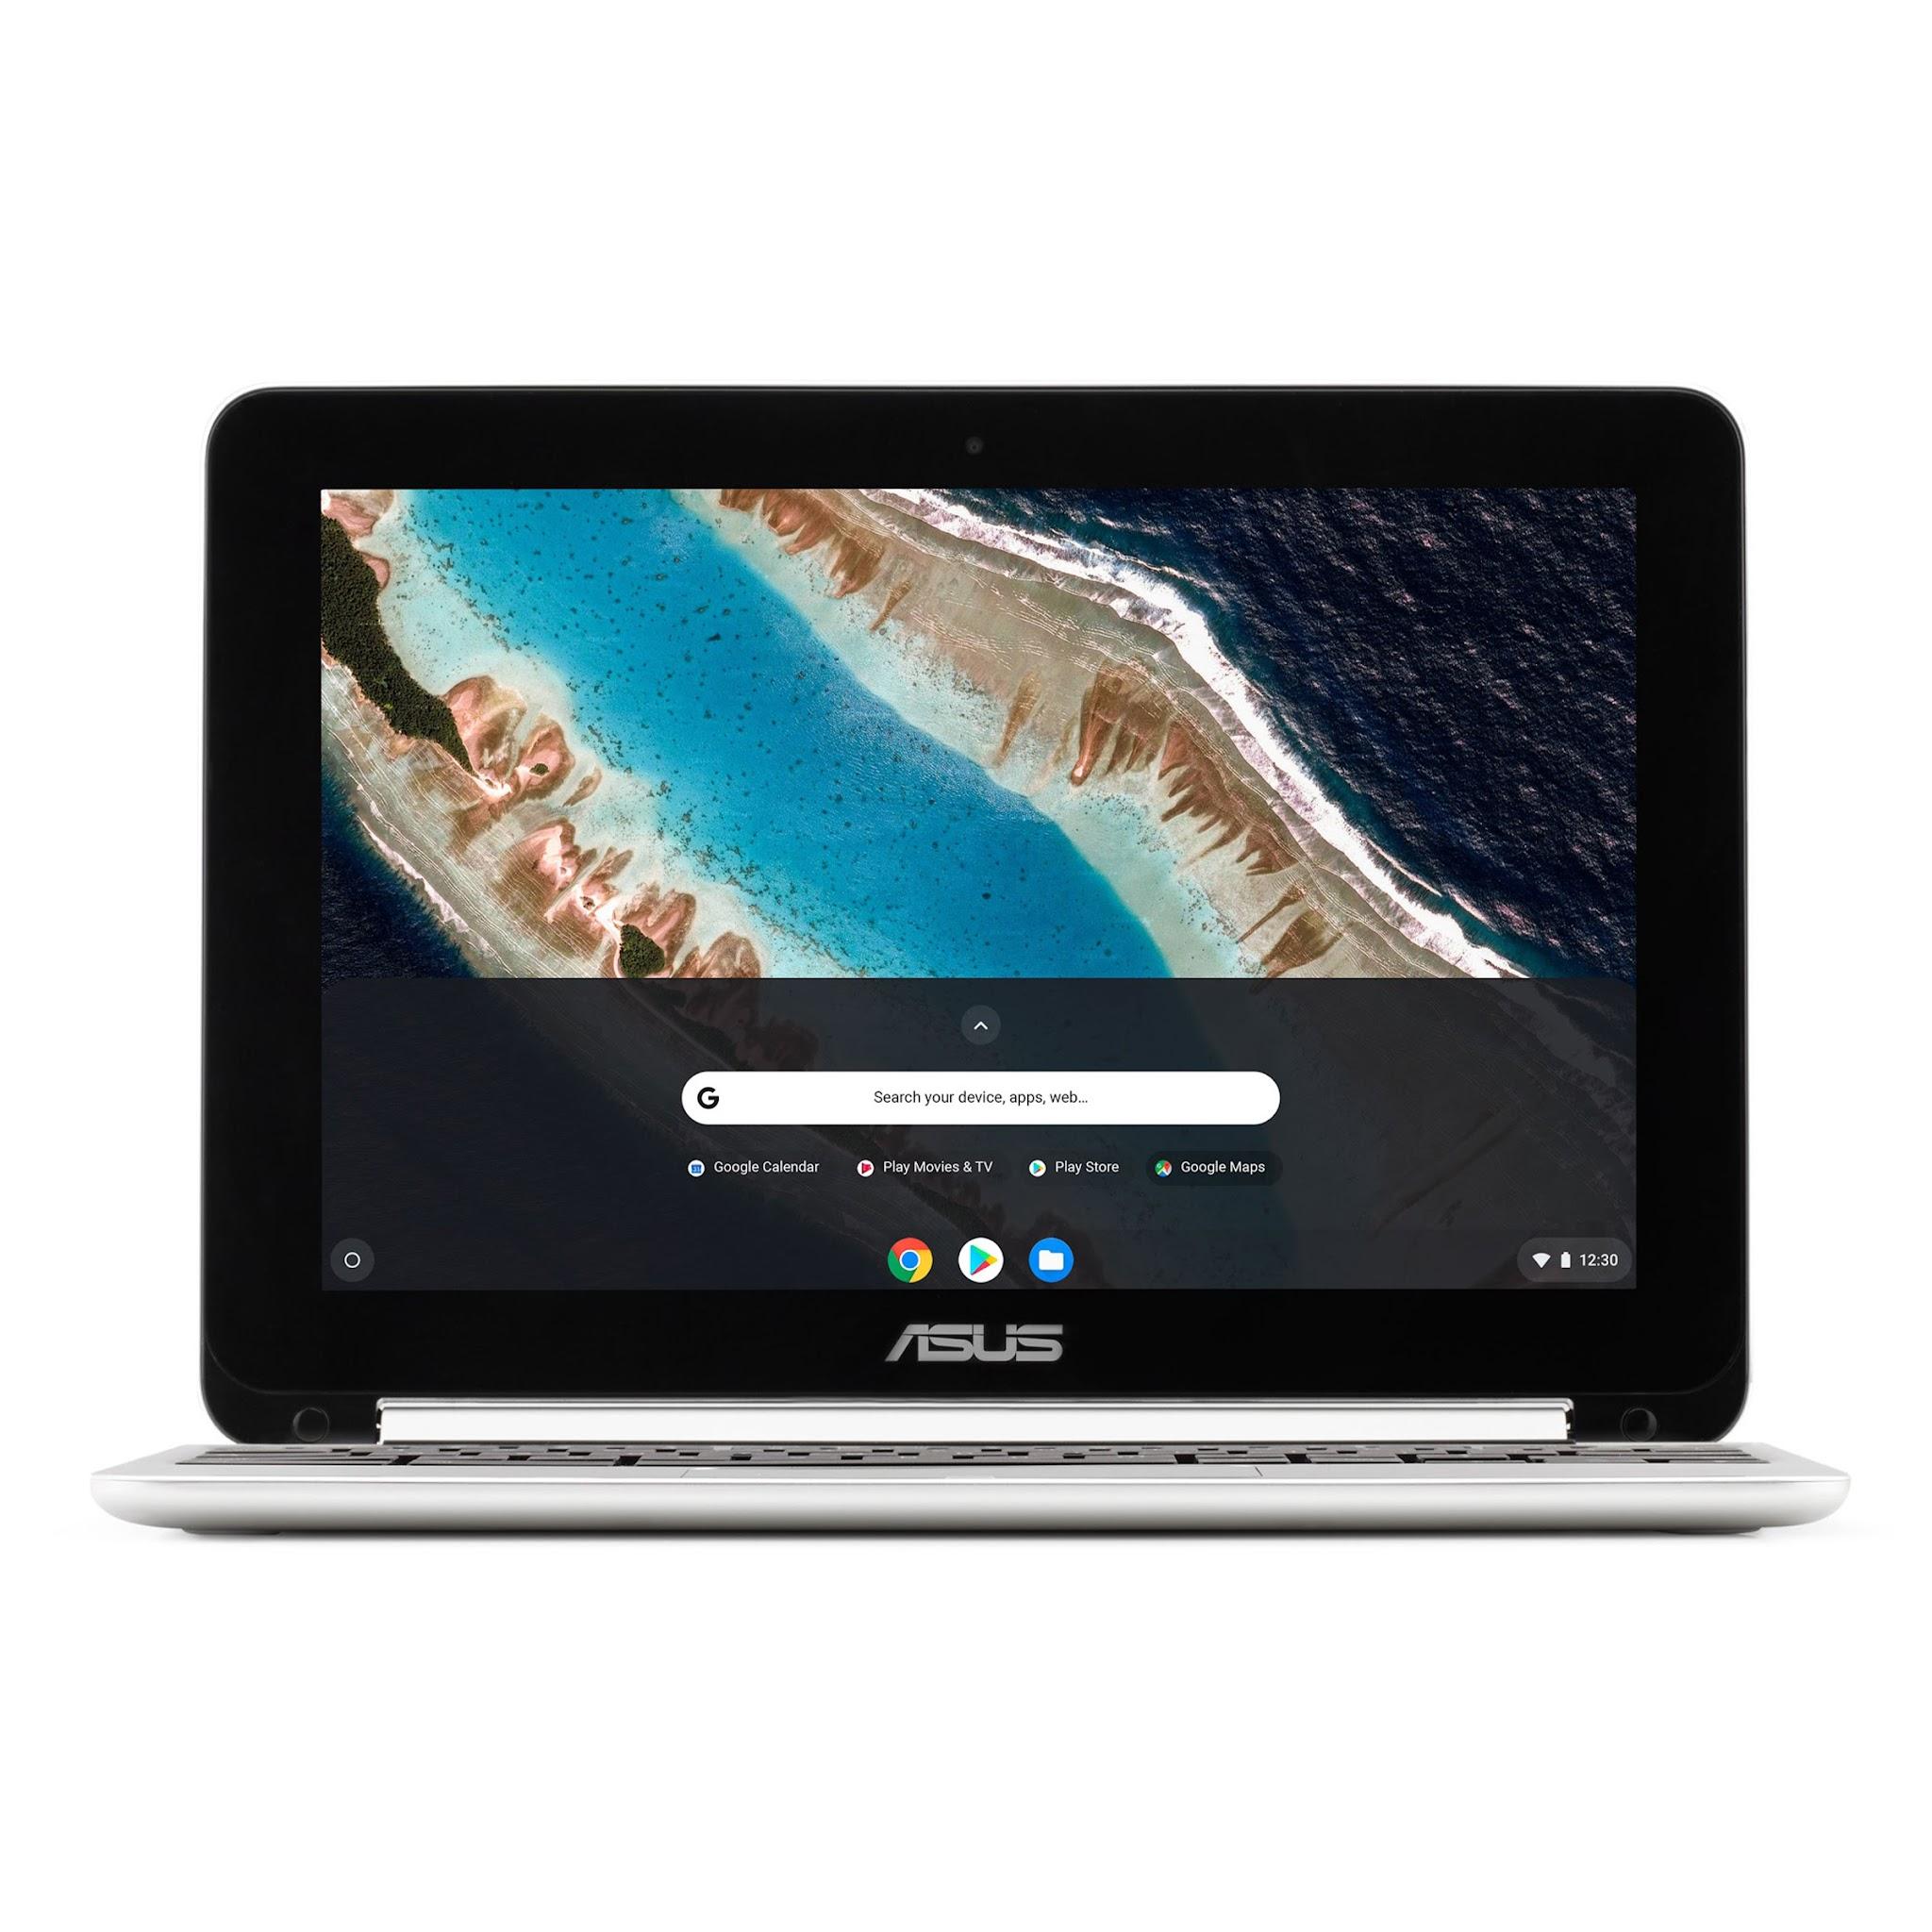 ASUS Chromebook Flip C101 PA - photo 1